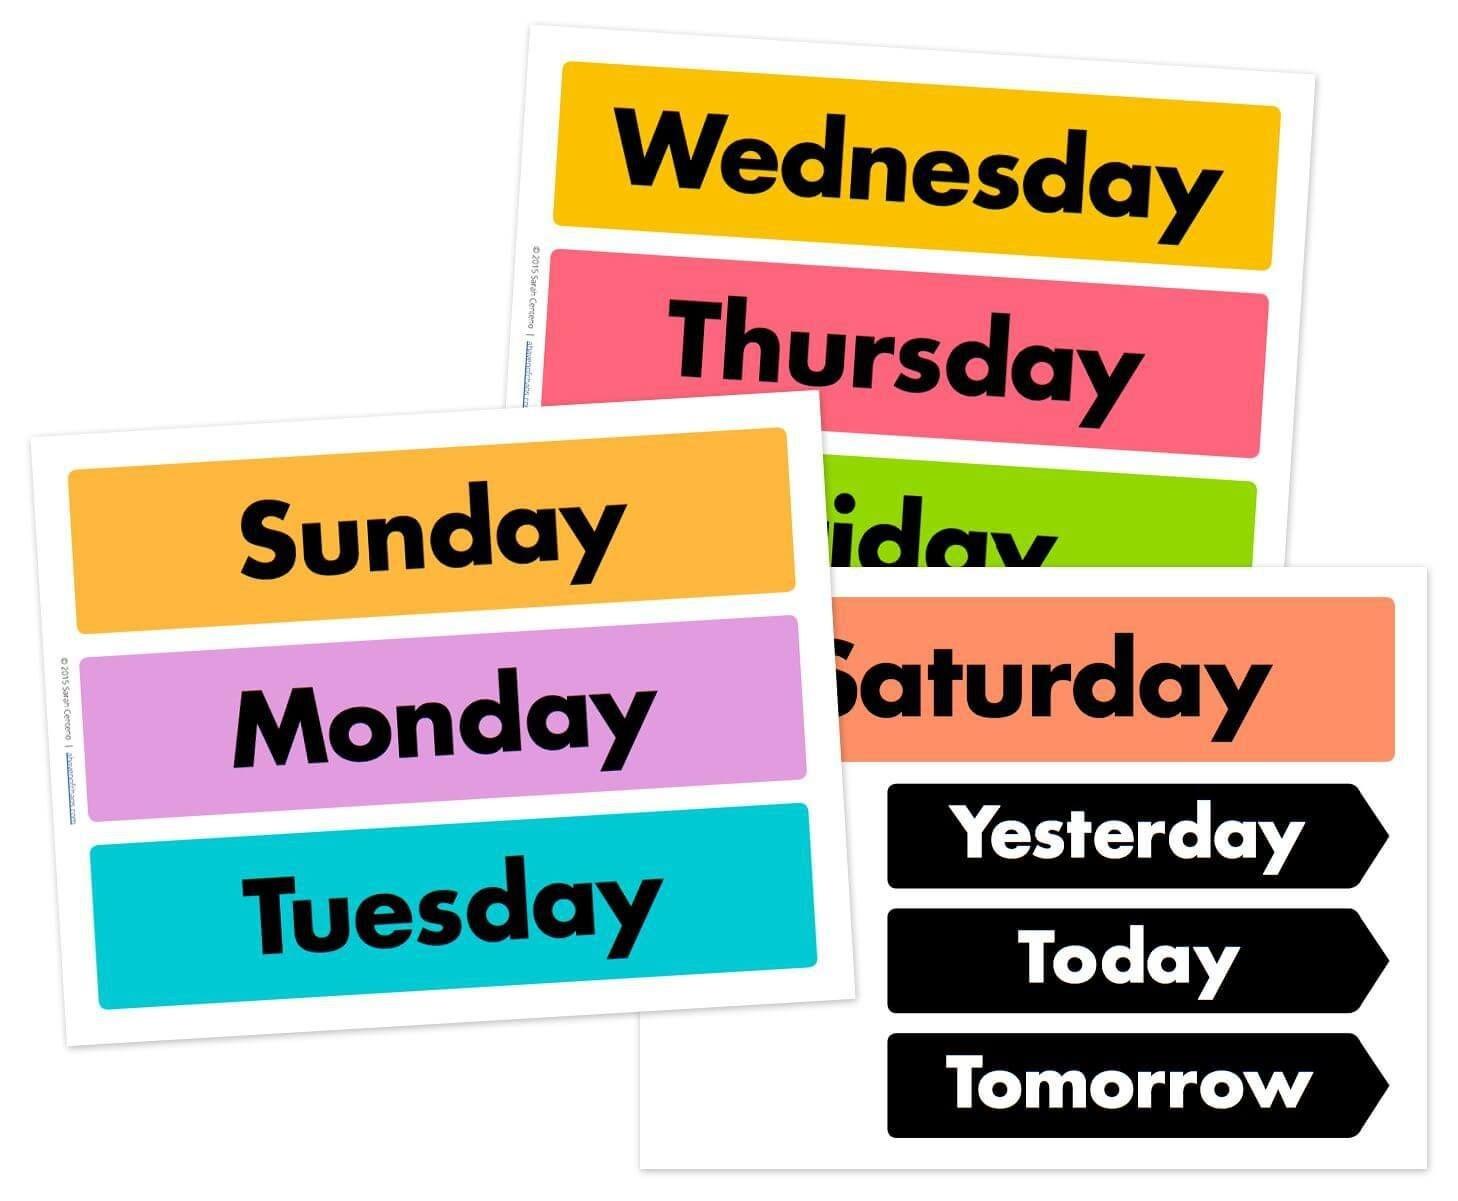 Days Of The Week Printable Free | Free Calendar Cards And Monthly - Free Printable Days Of The Week